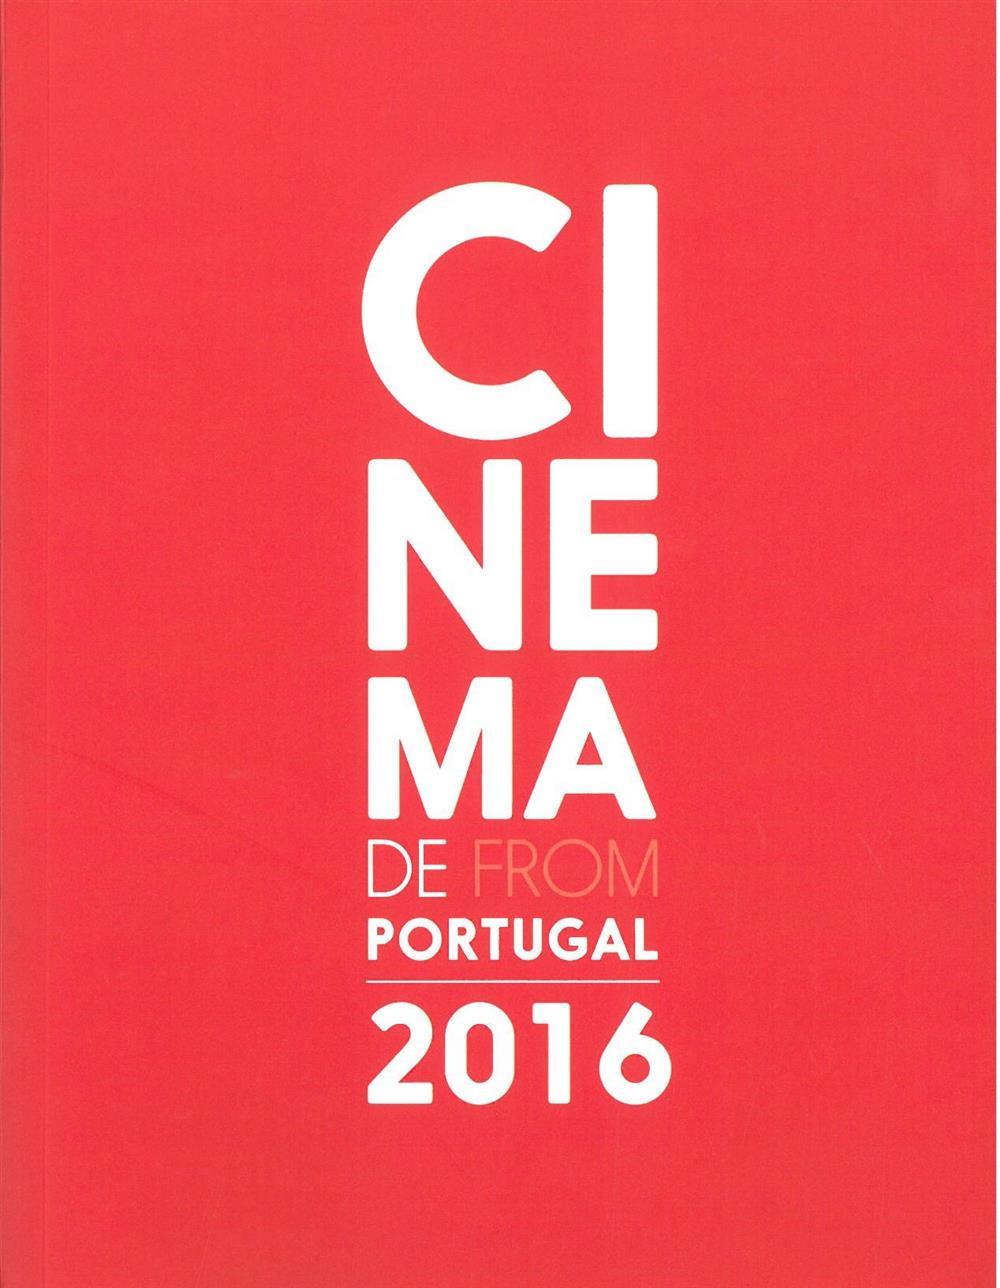 Cinema de Portugal_.jpg